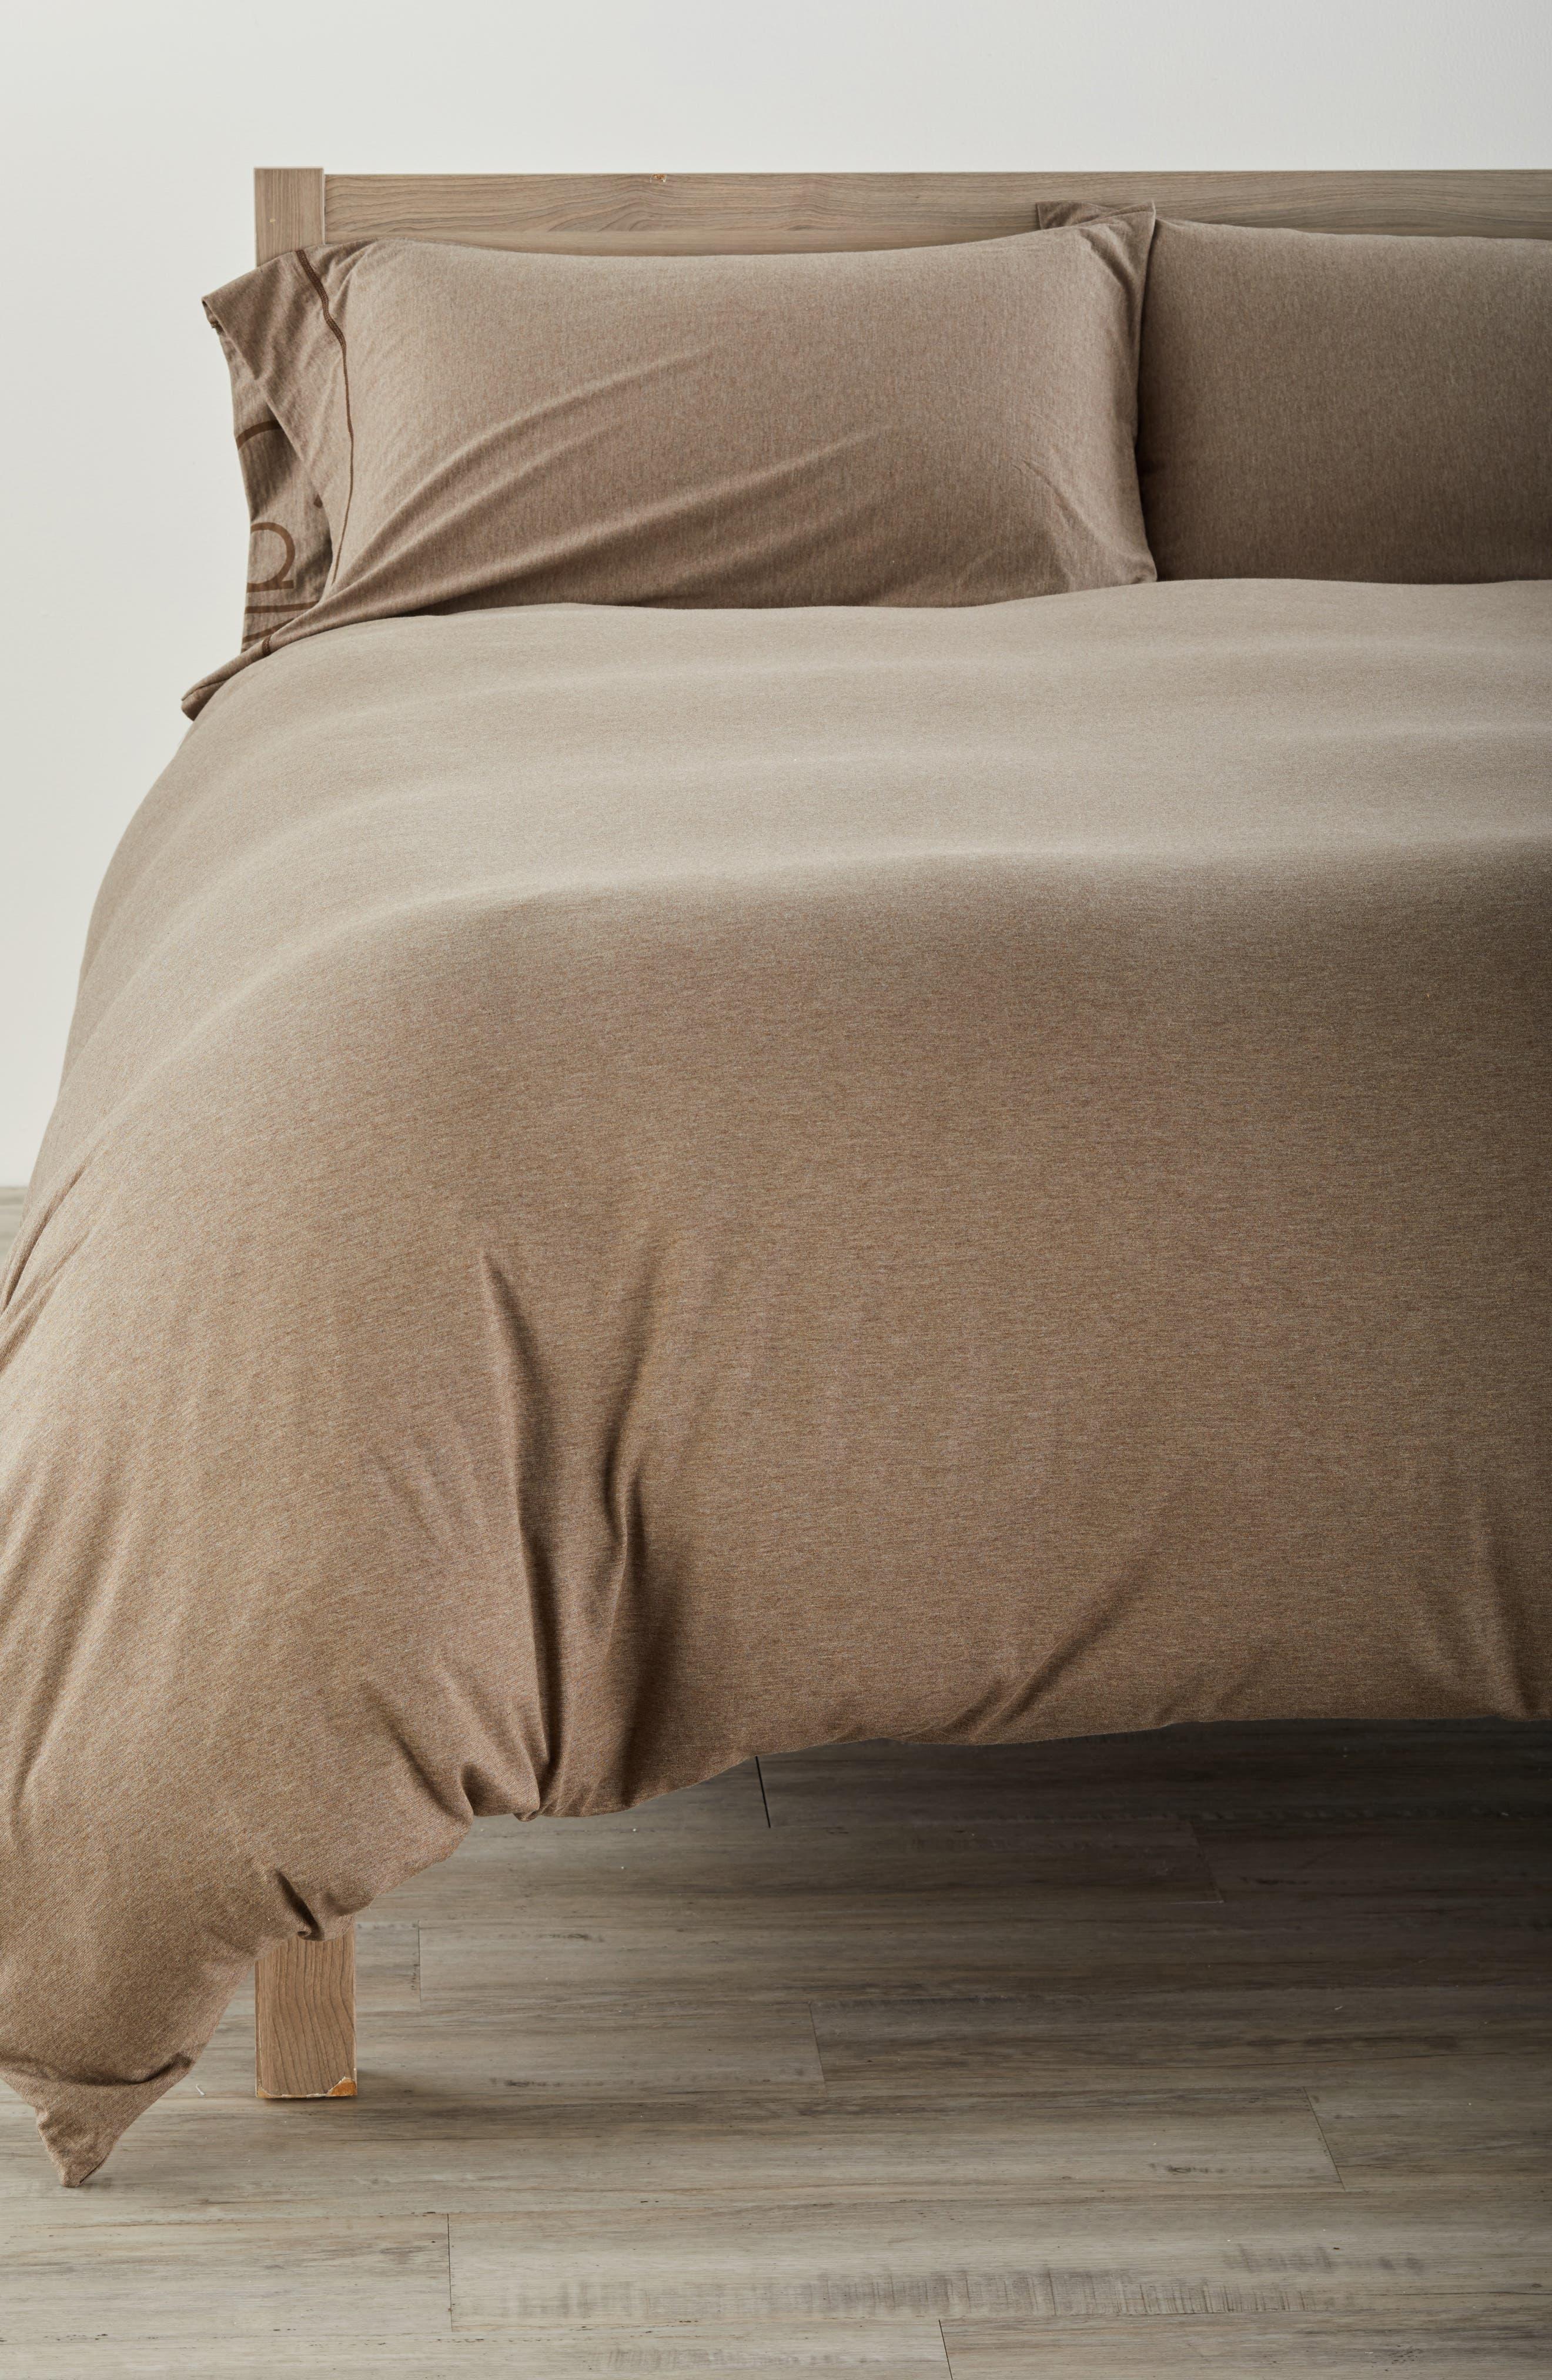 Alternate Image 1 Selected - Calvin Klein Home Cotton & Modal Jersey Duvet Cover